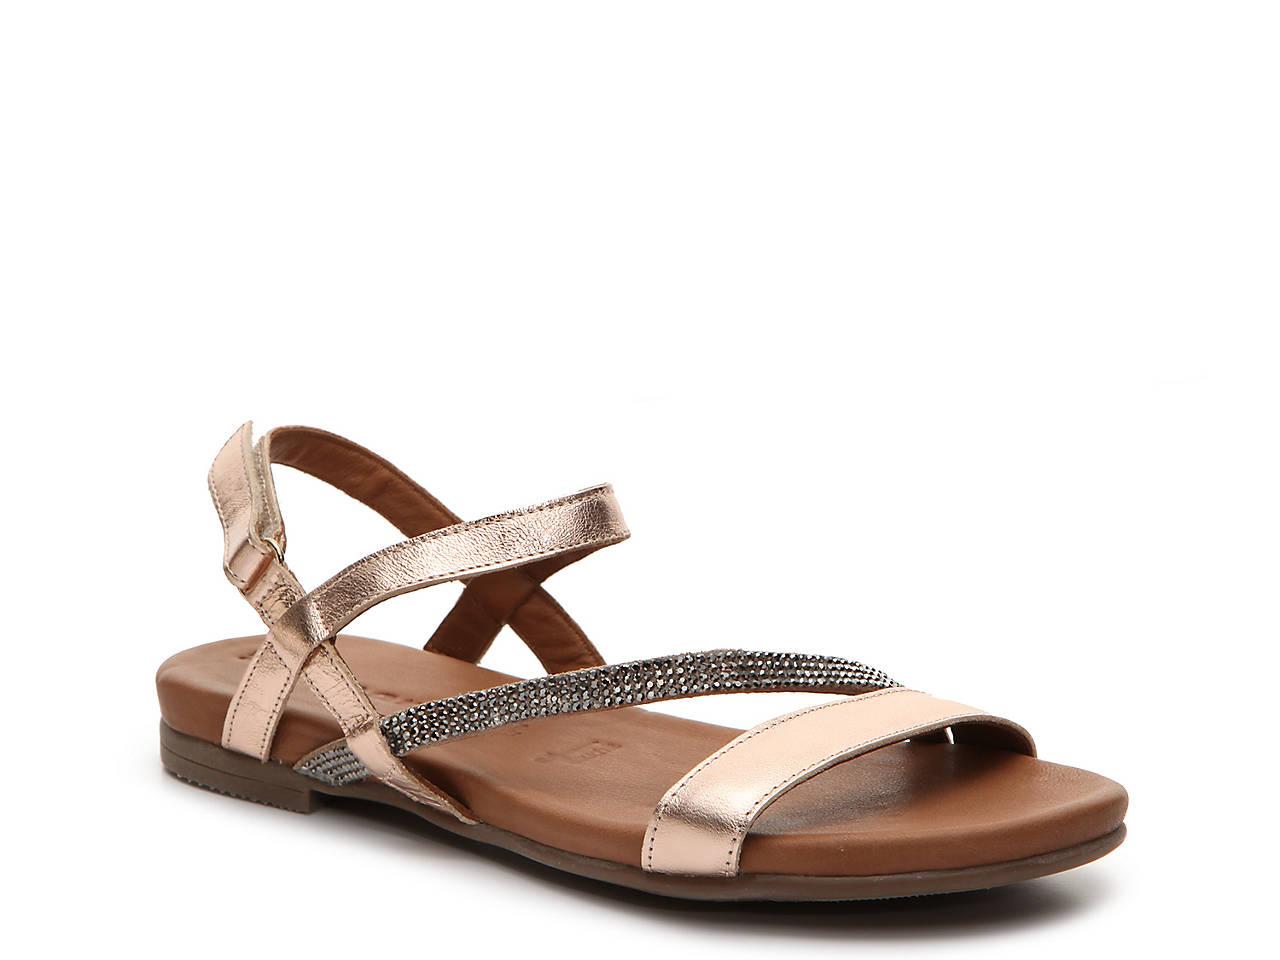 9c07743c111b39 Tamaris Kim Flat Sandal Women s Shoes